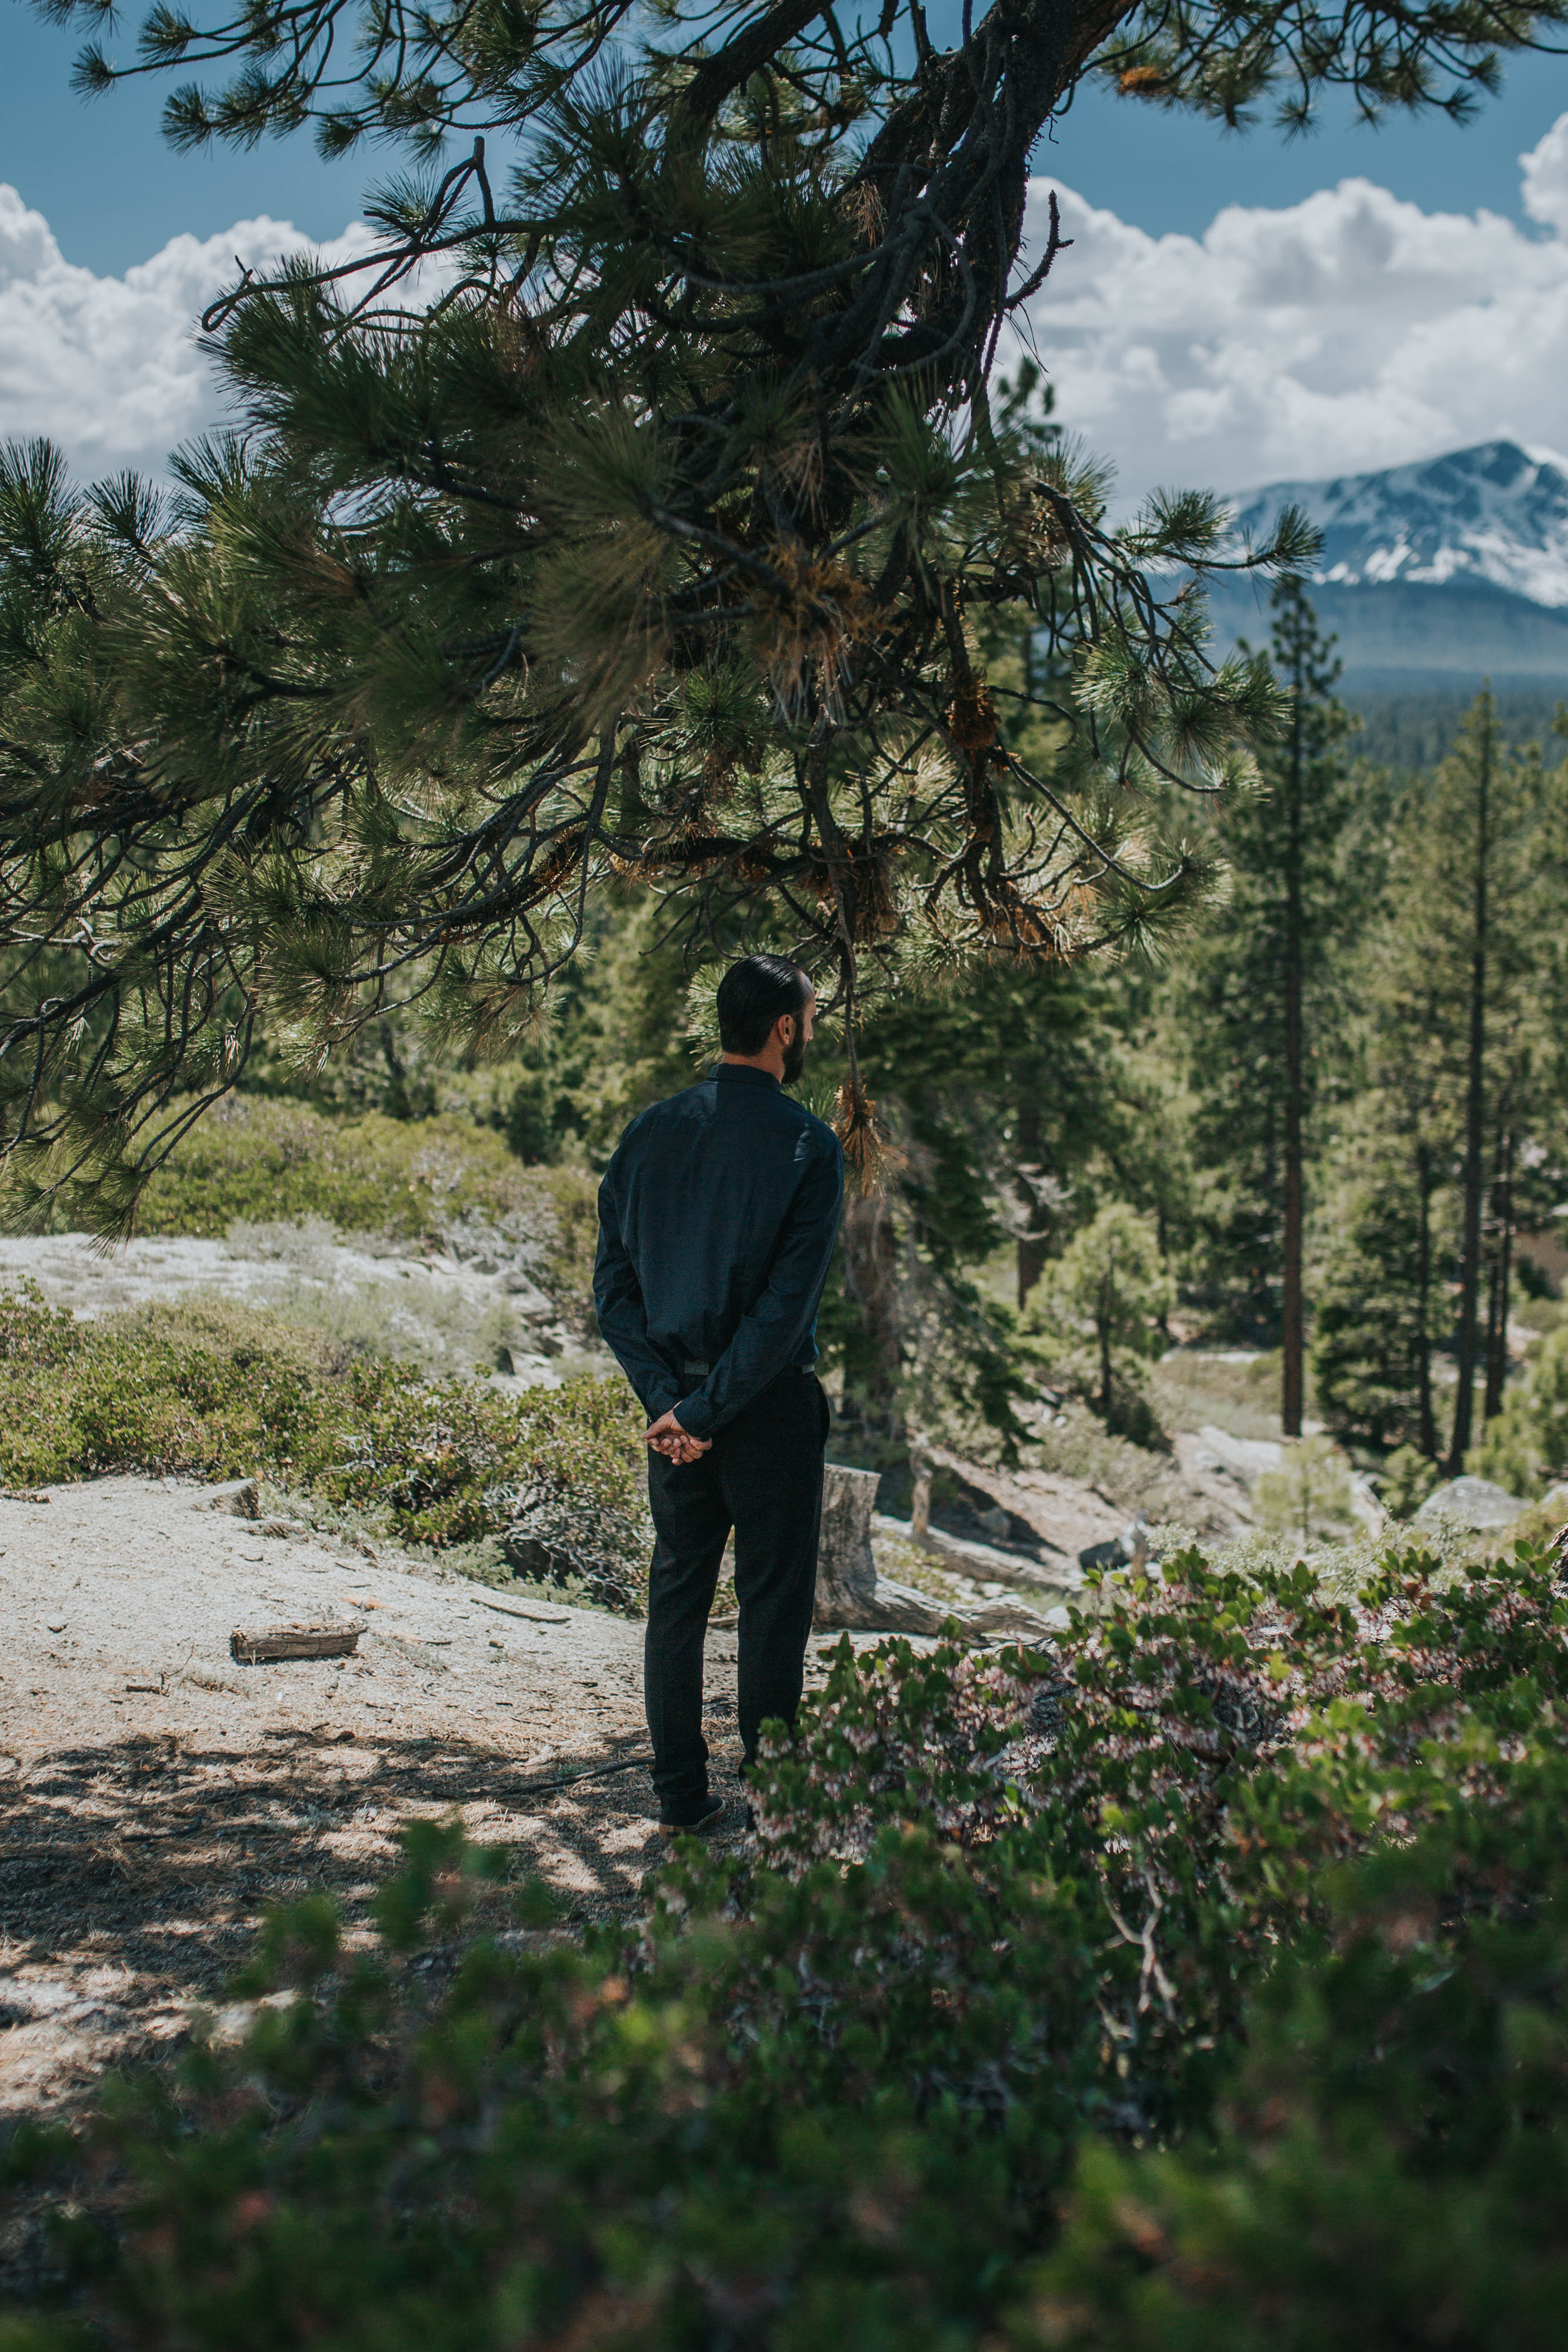 south-lake-tahoe-elopement-valerie-lendvay-photo-003.jpg